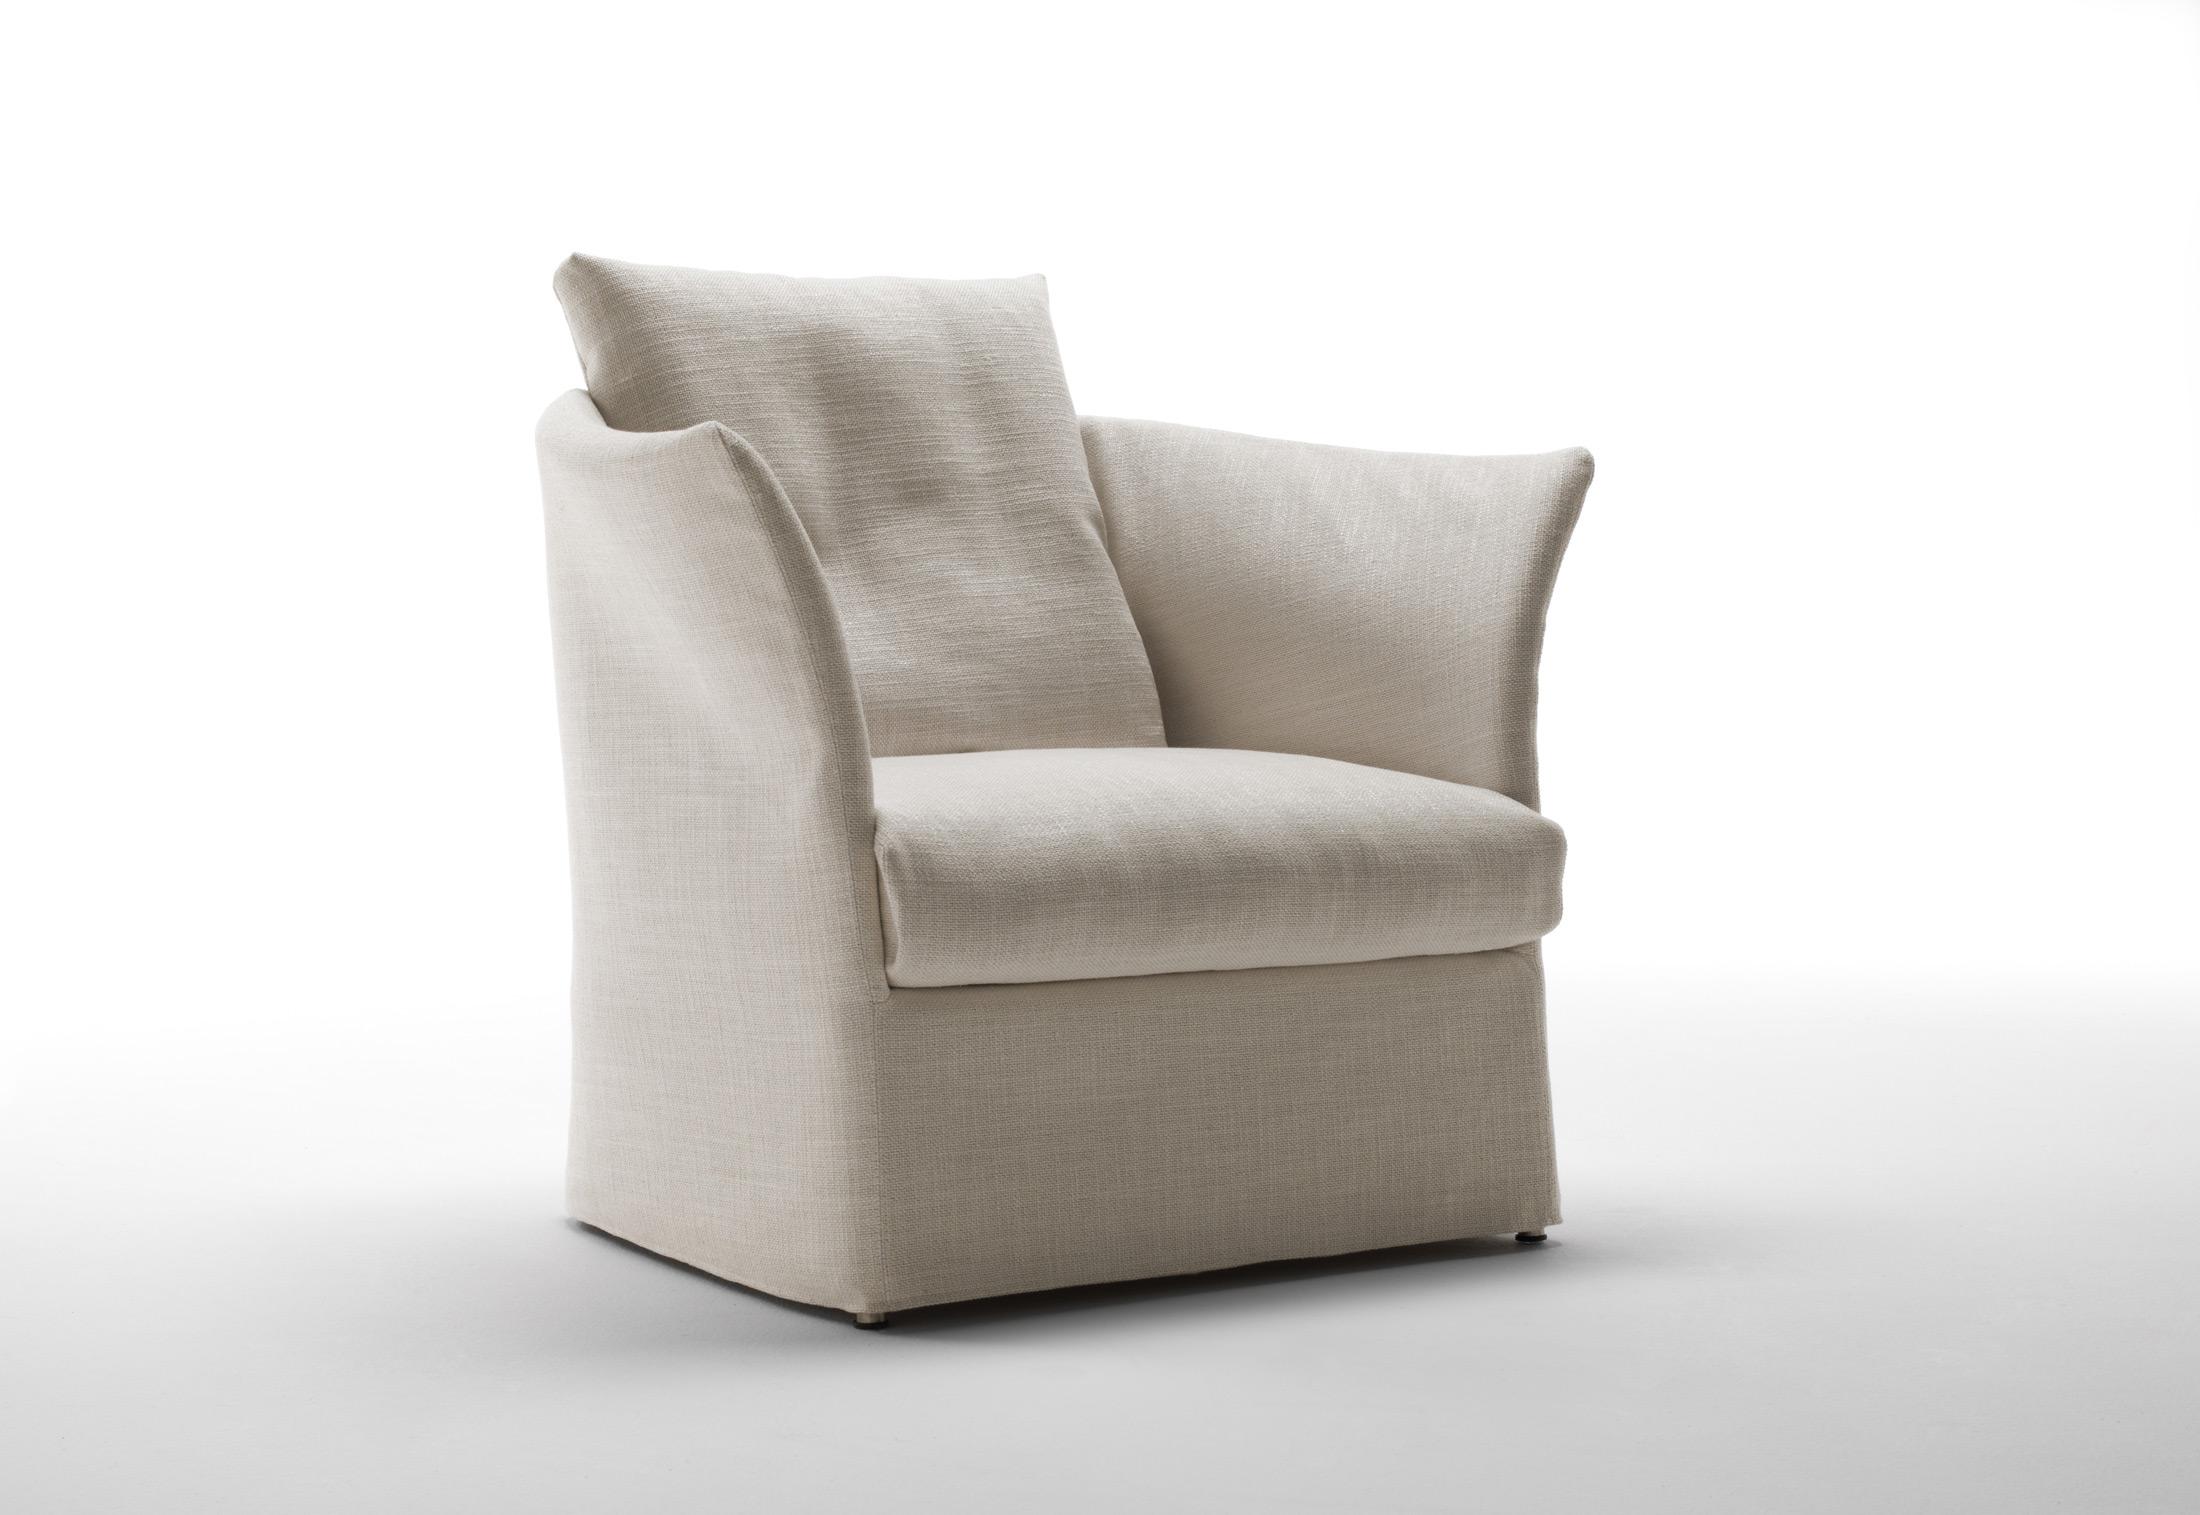 Curve Arm Chair By Living Divani Stylepark